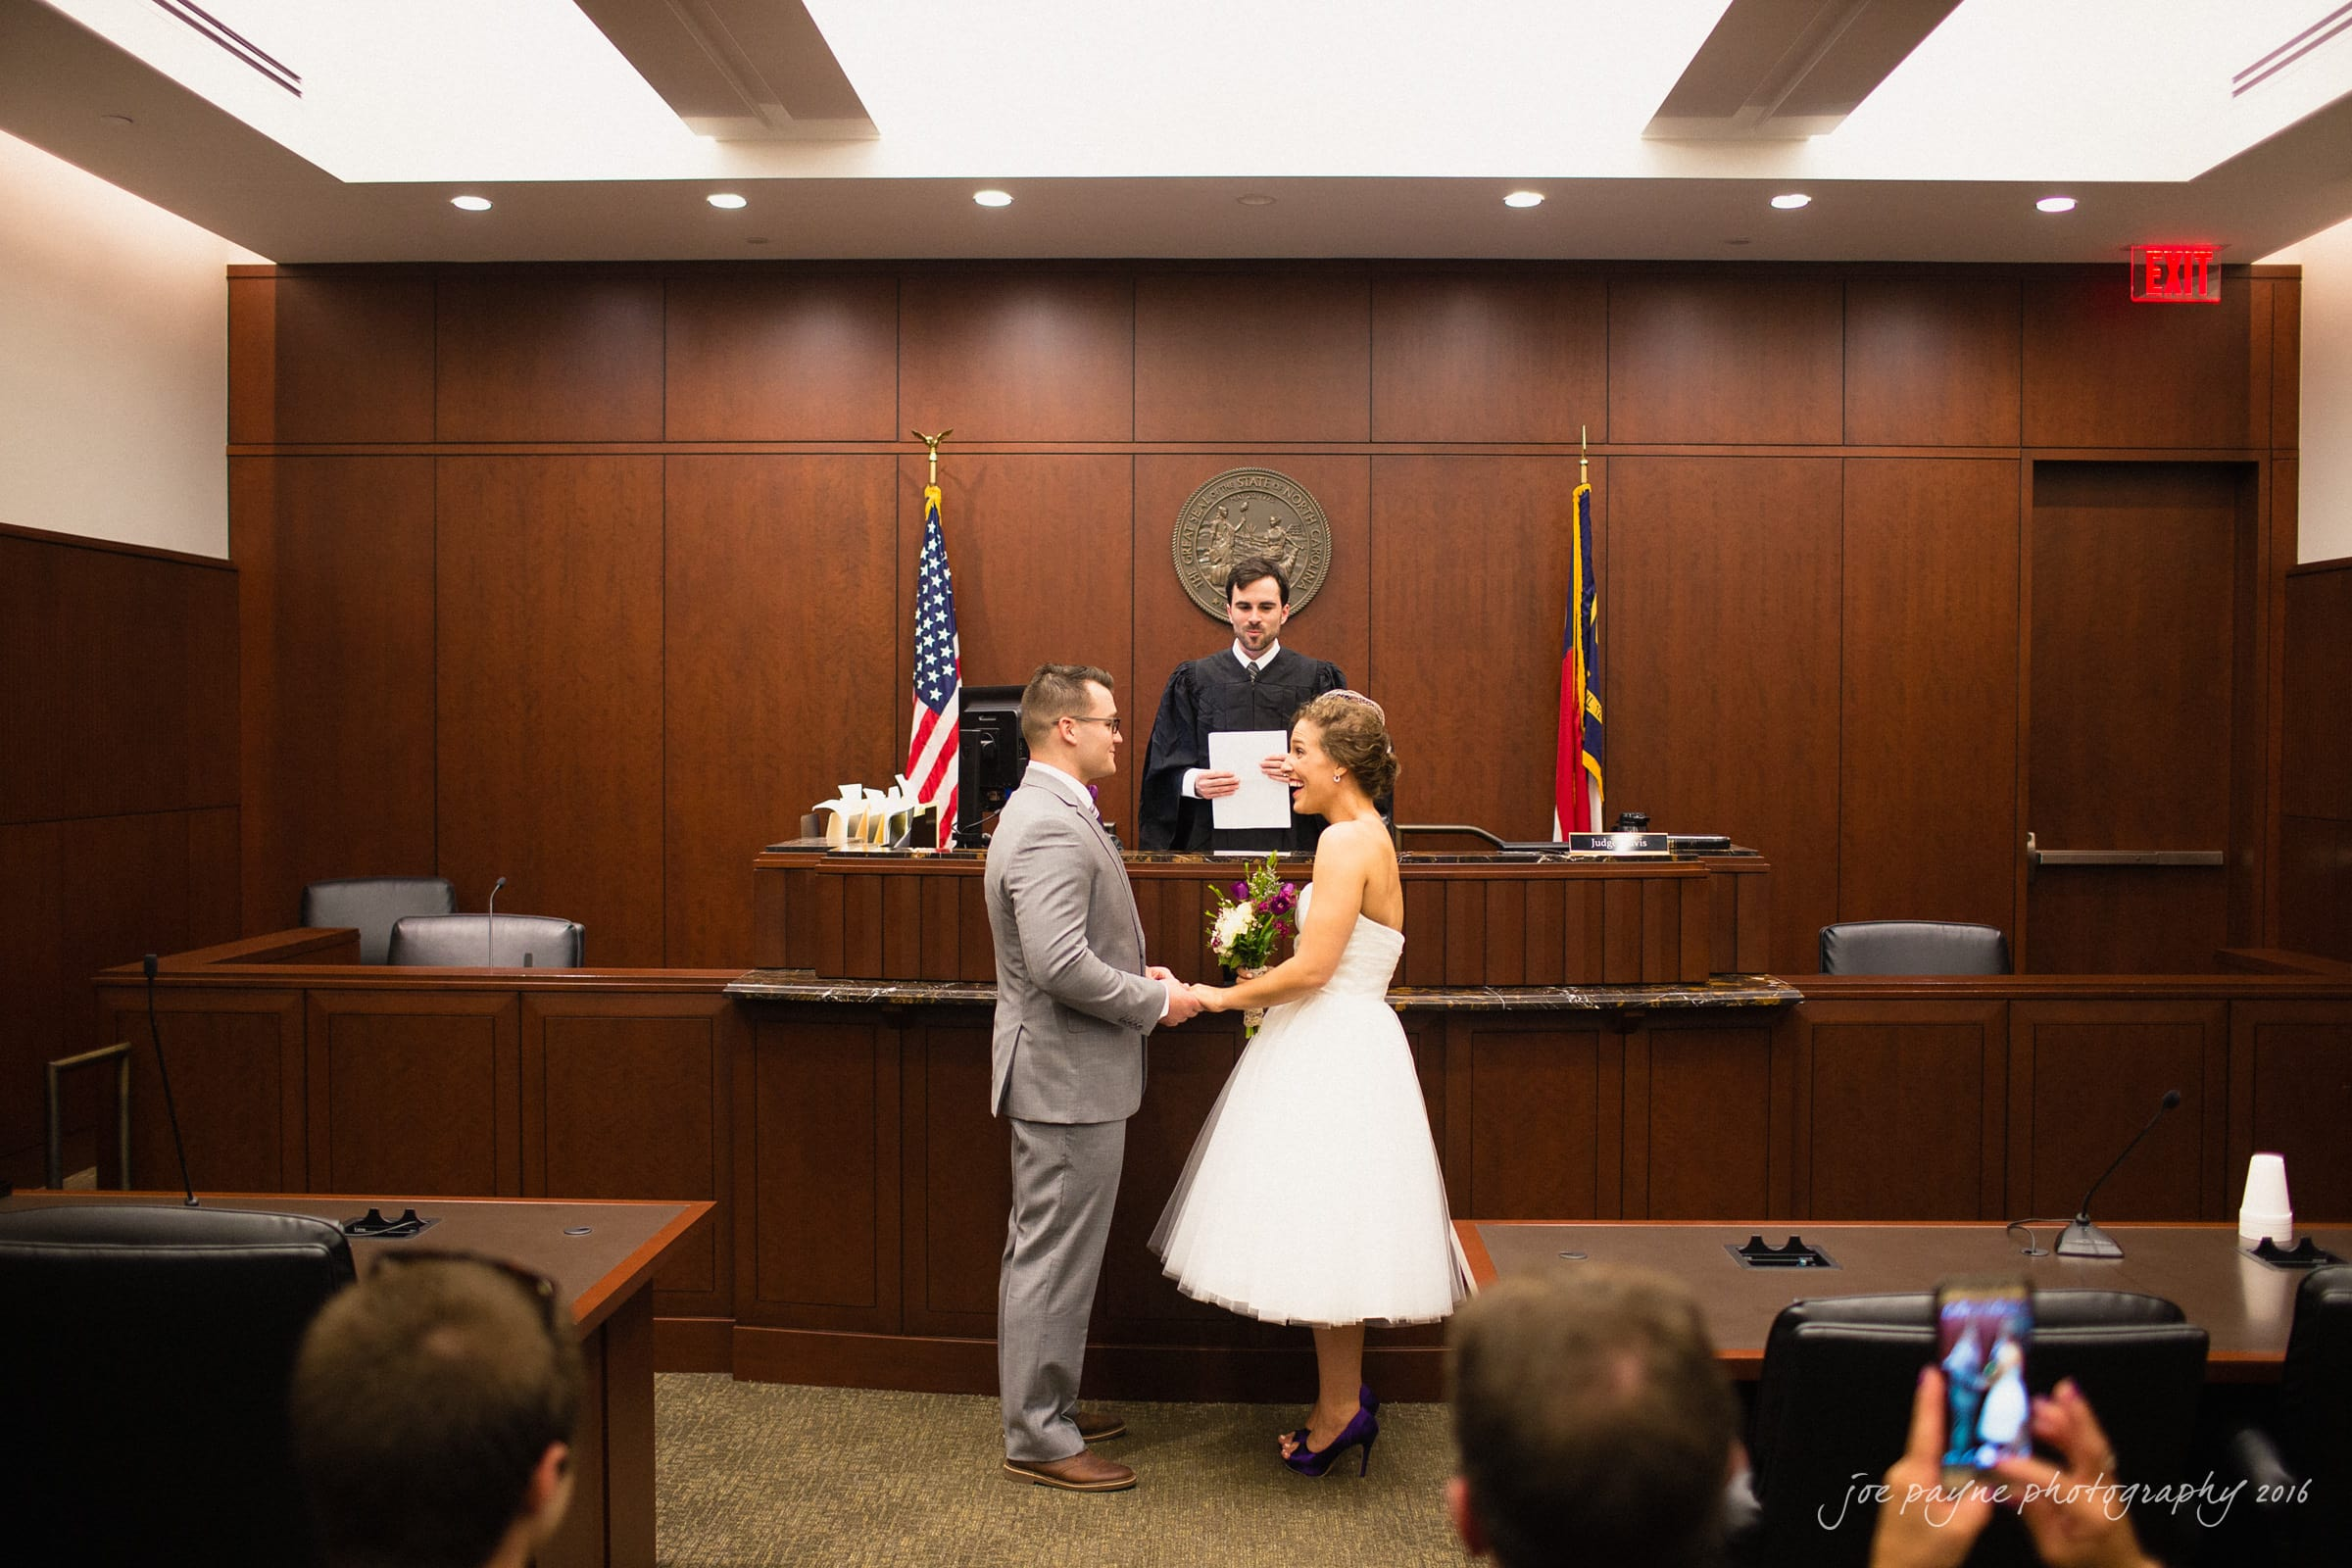 Downtown Raleigh Wedding Photographer - Alexandra & Trent -7